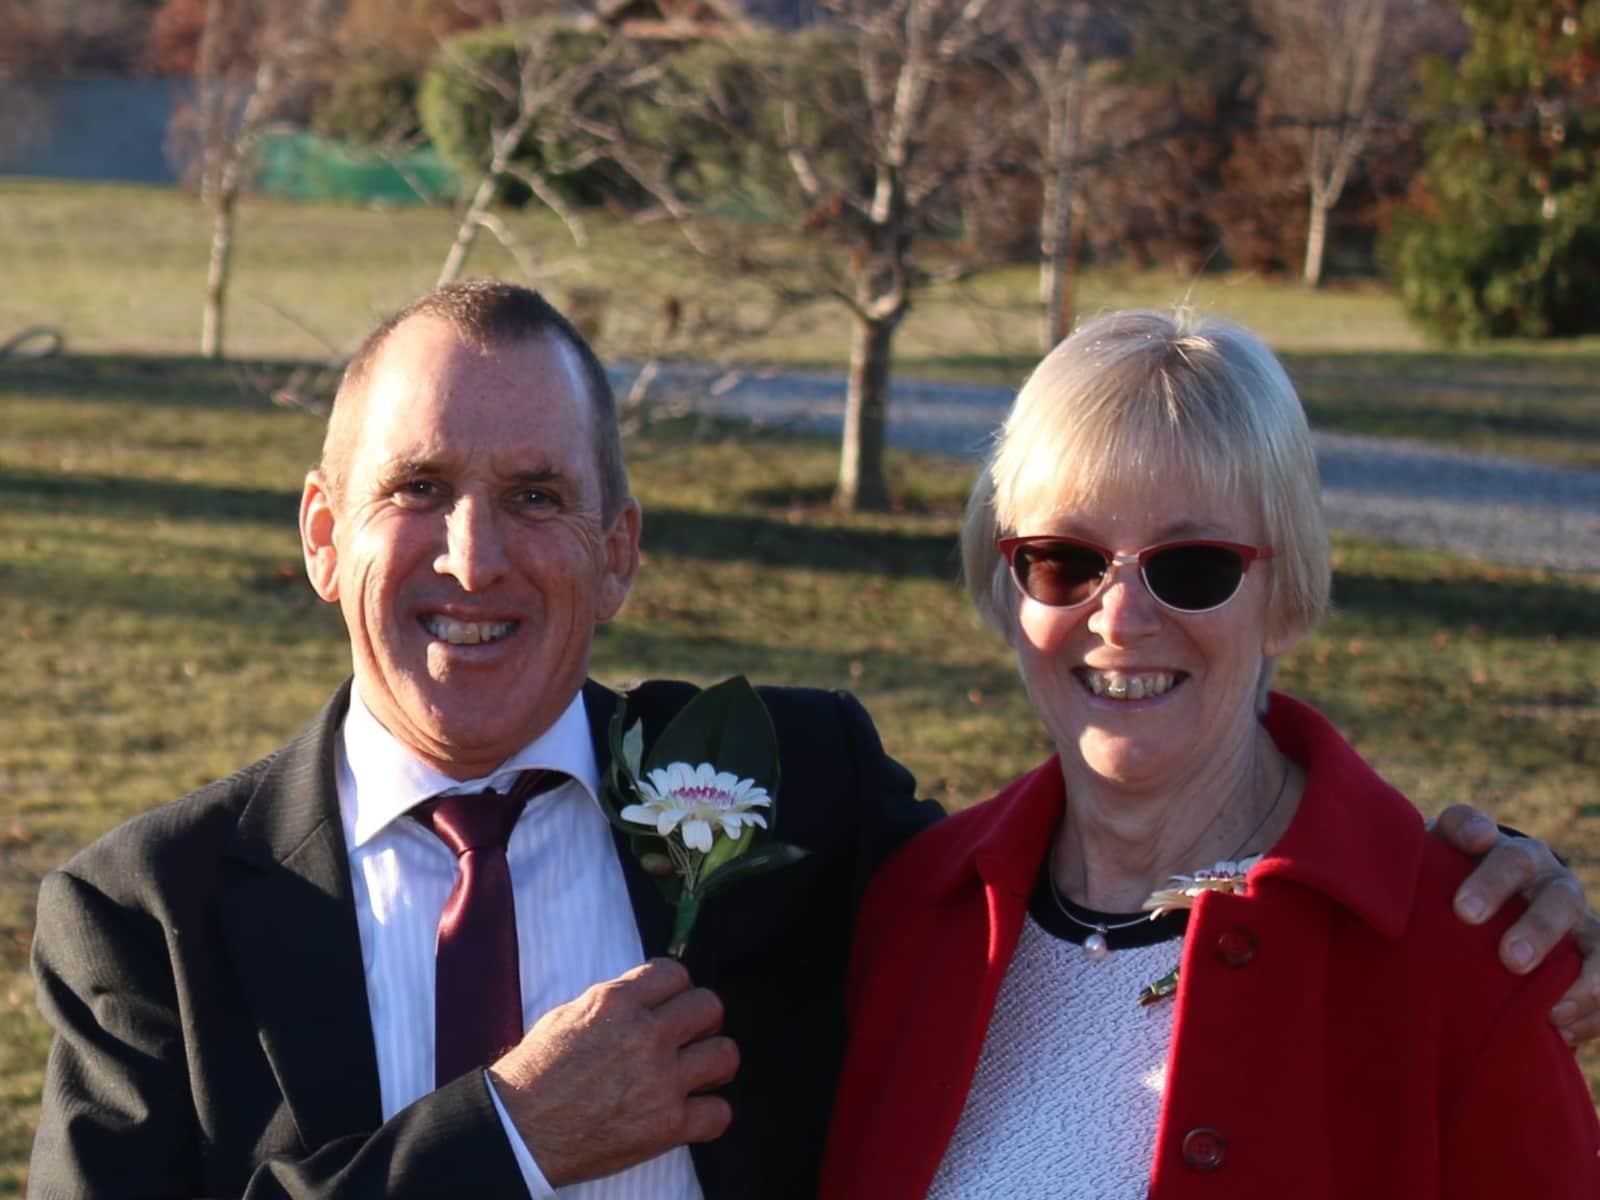 Helen & John from Darwin, Northern Territory, Australia